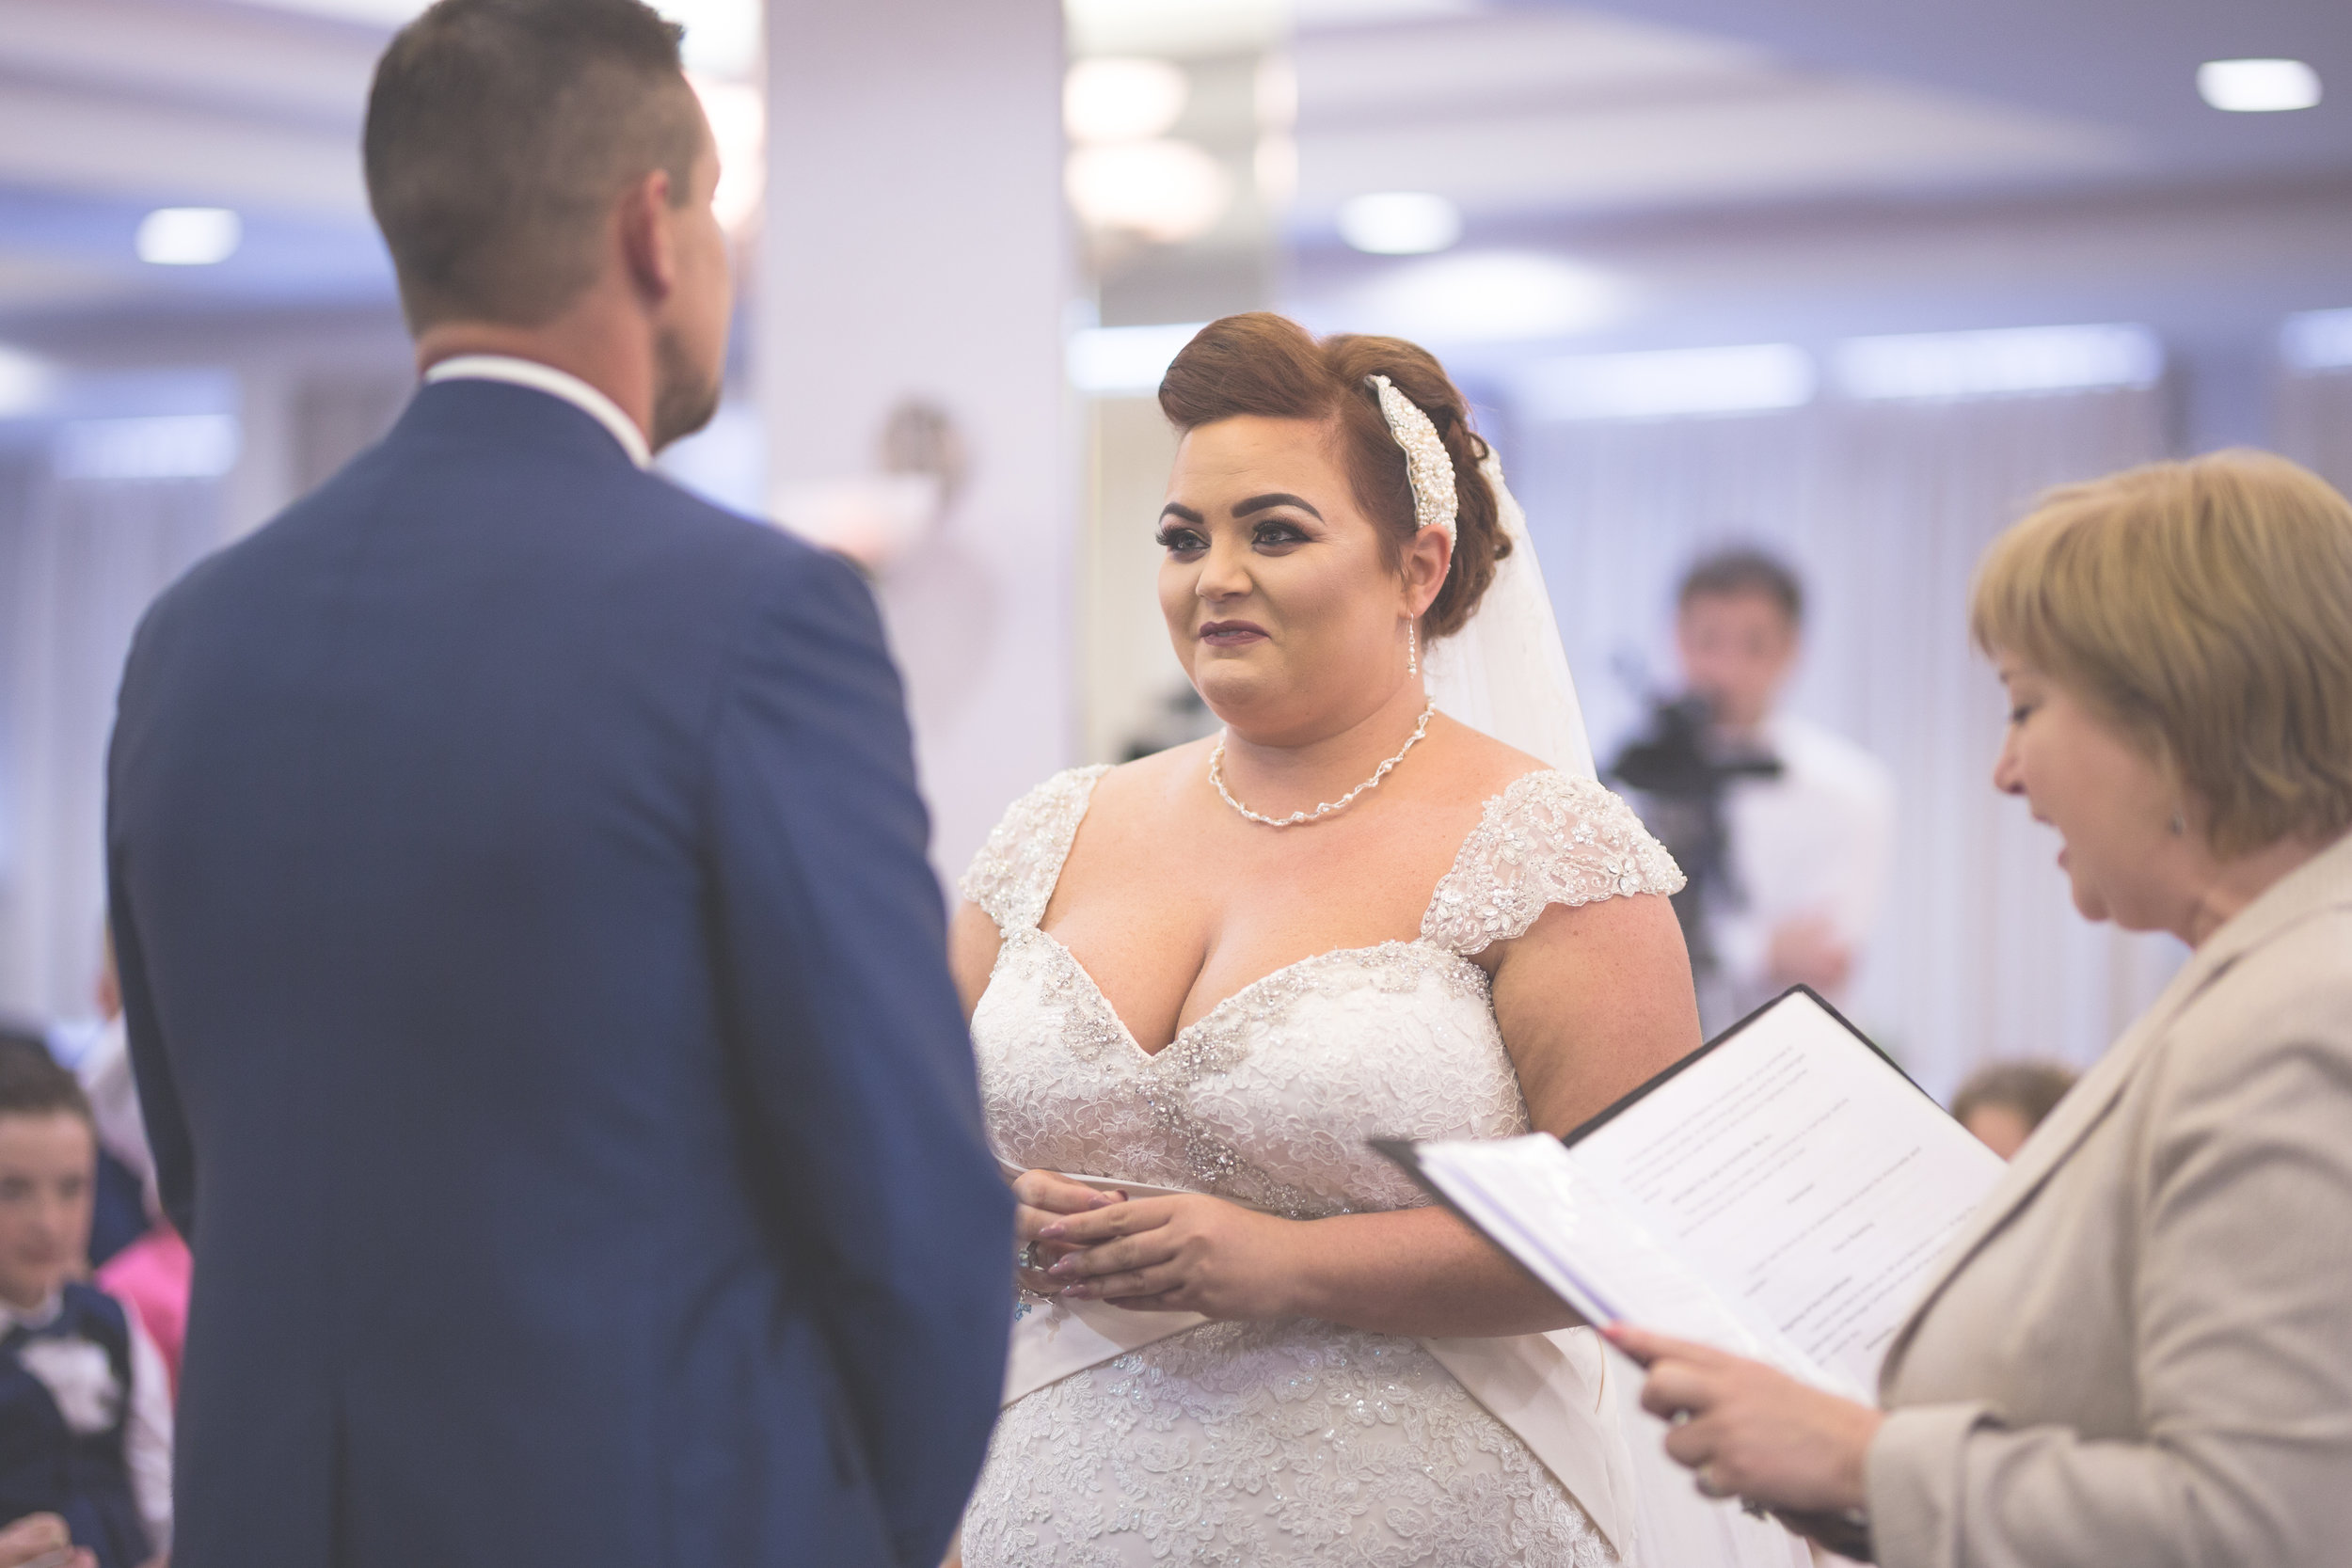 Antoinette & Stephen - Ceremony | Brian McEwan Photography | Wedding Photographer Northern Ireland 85.jpg